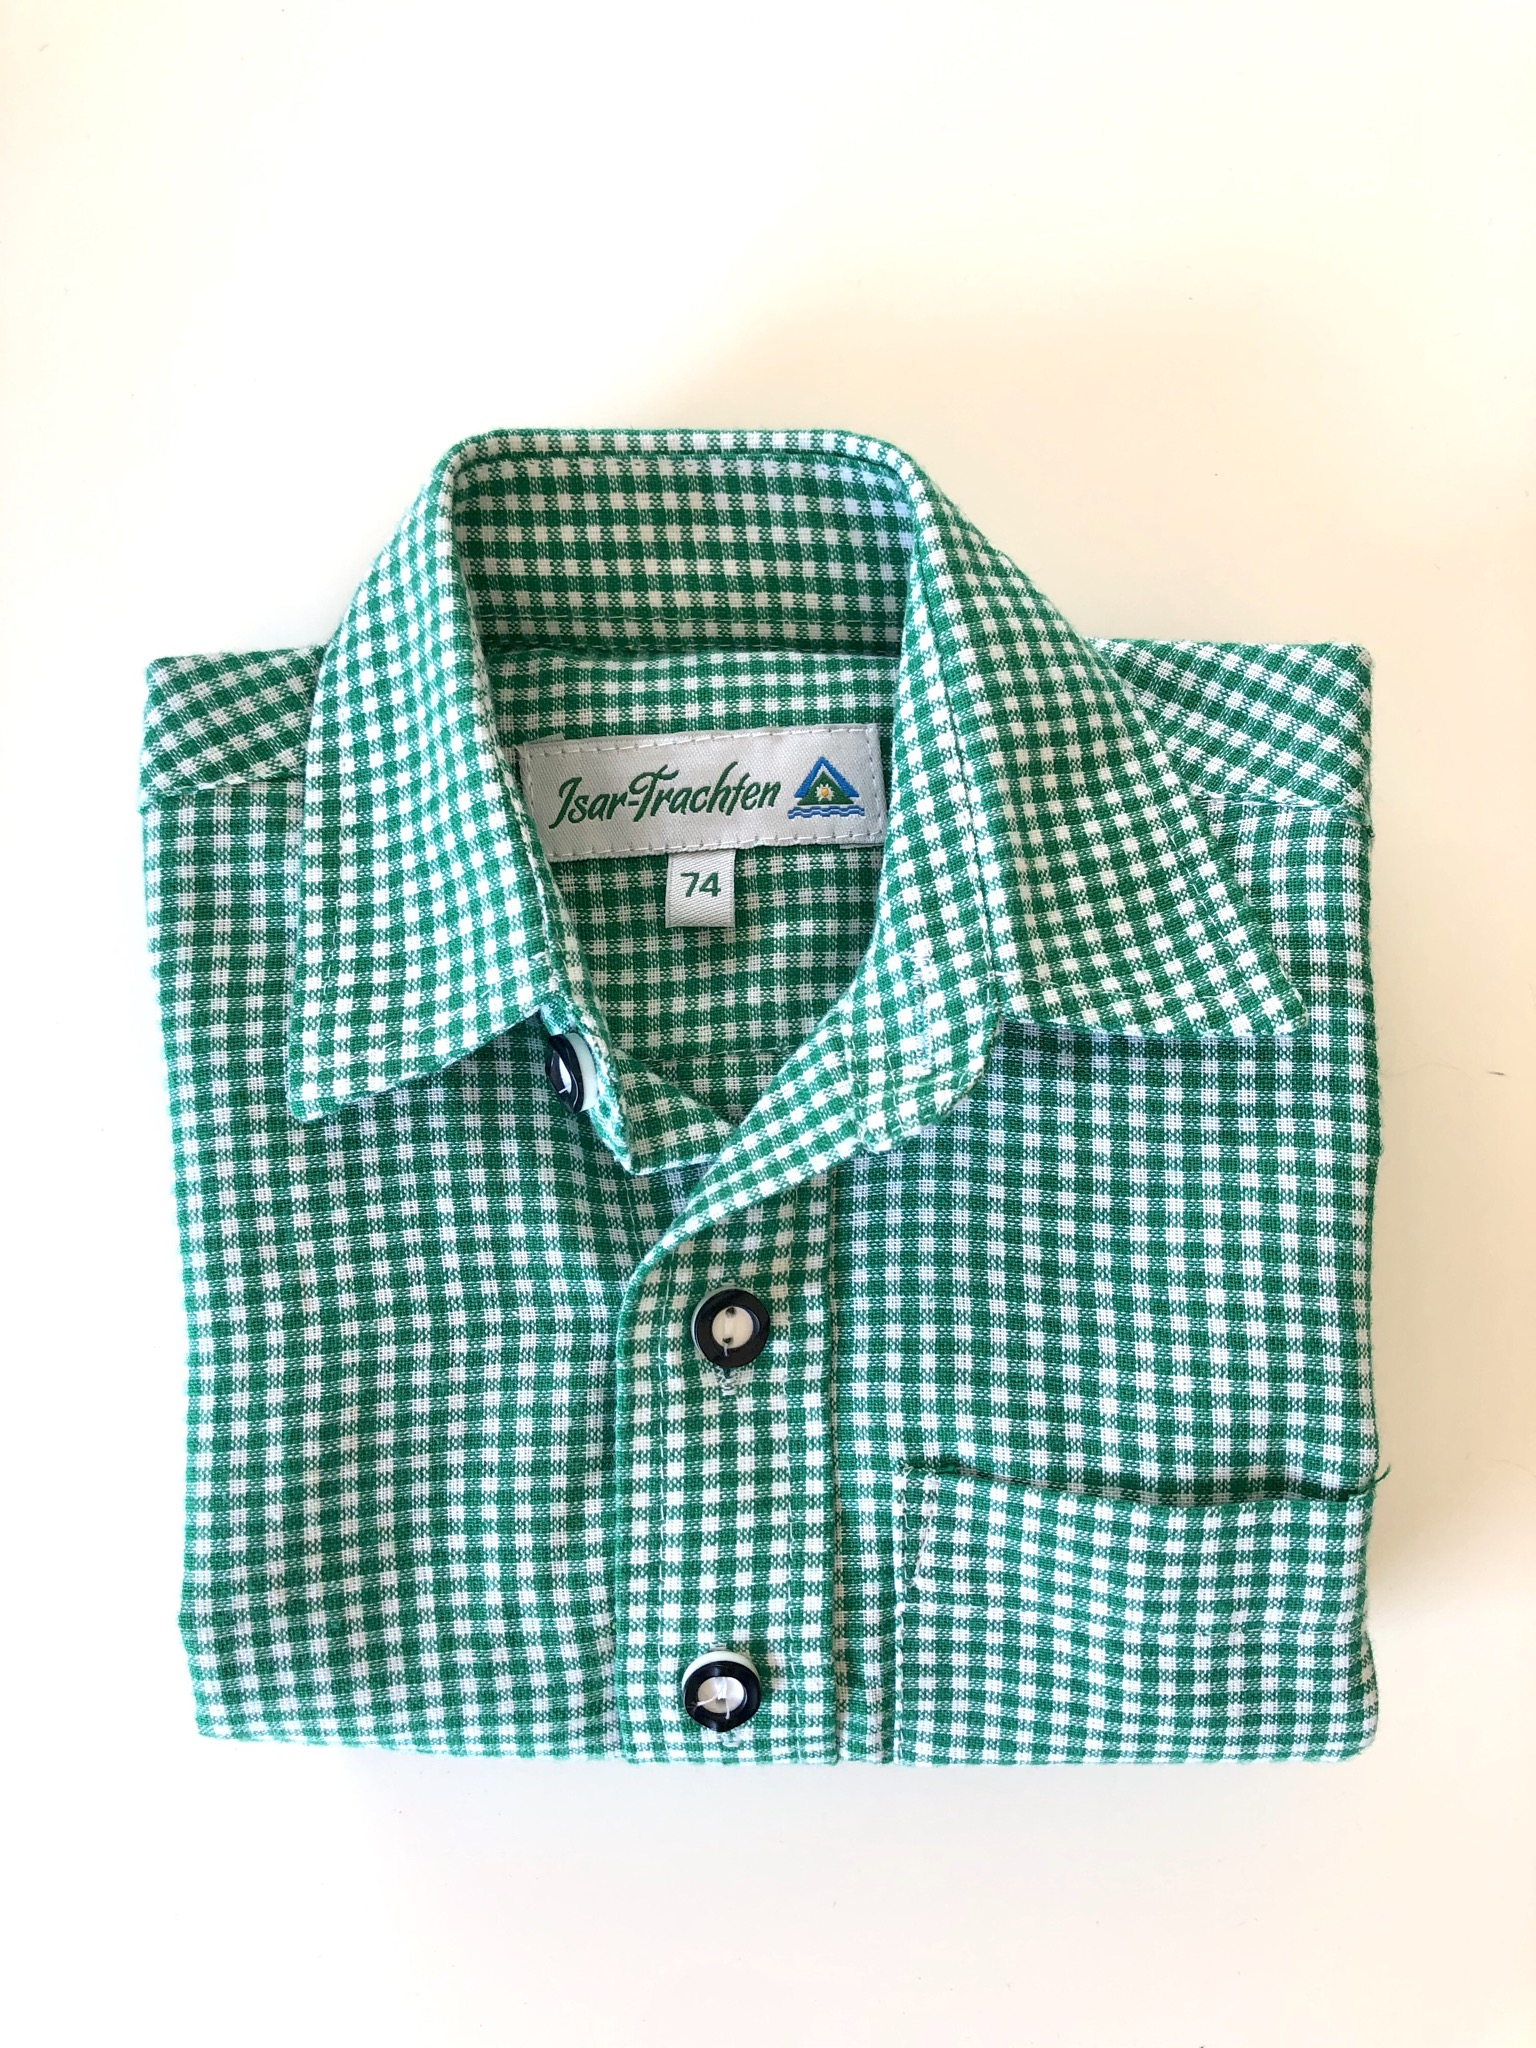 Gr. 74 Isar Trachten Trachtenhemd grün